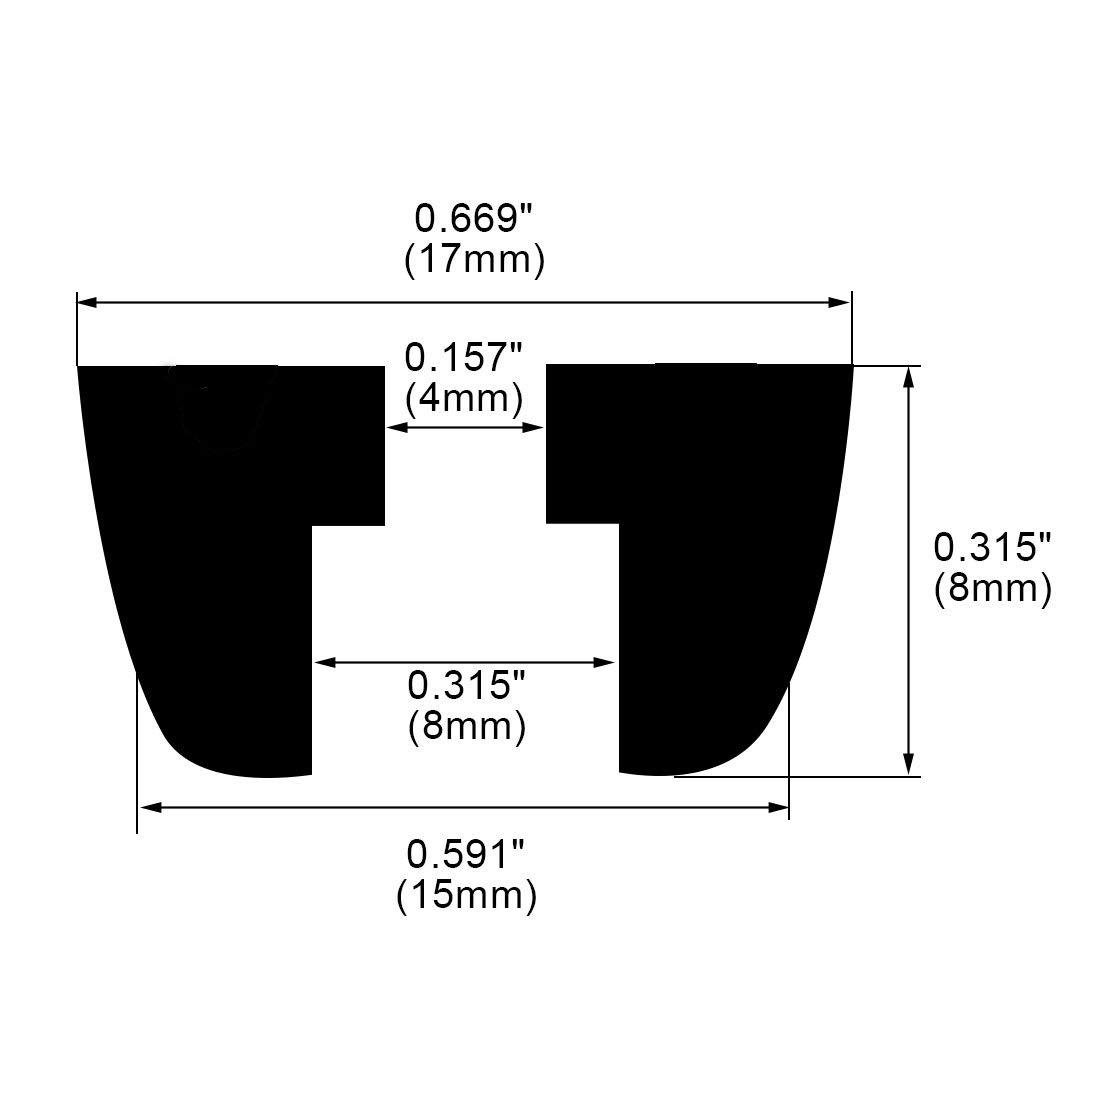 D17x15xH8mm uxcell 48pcs Rubber Feet Bumper Furniture Table Amplifier Speaker Cabinet Leg Pads Protector